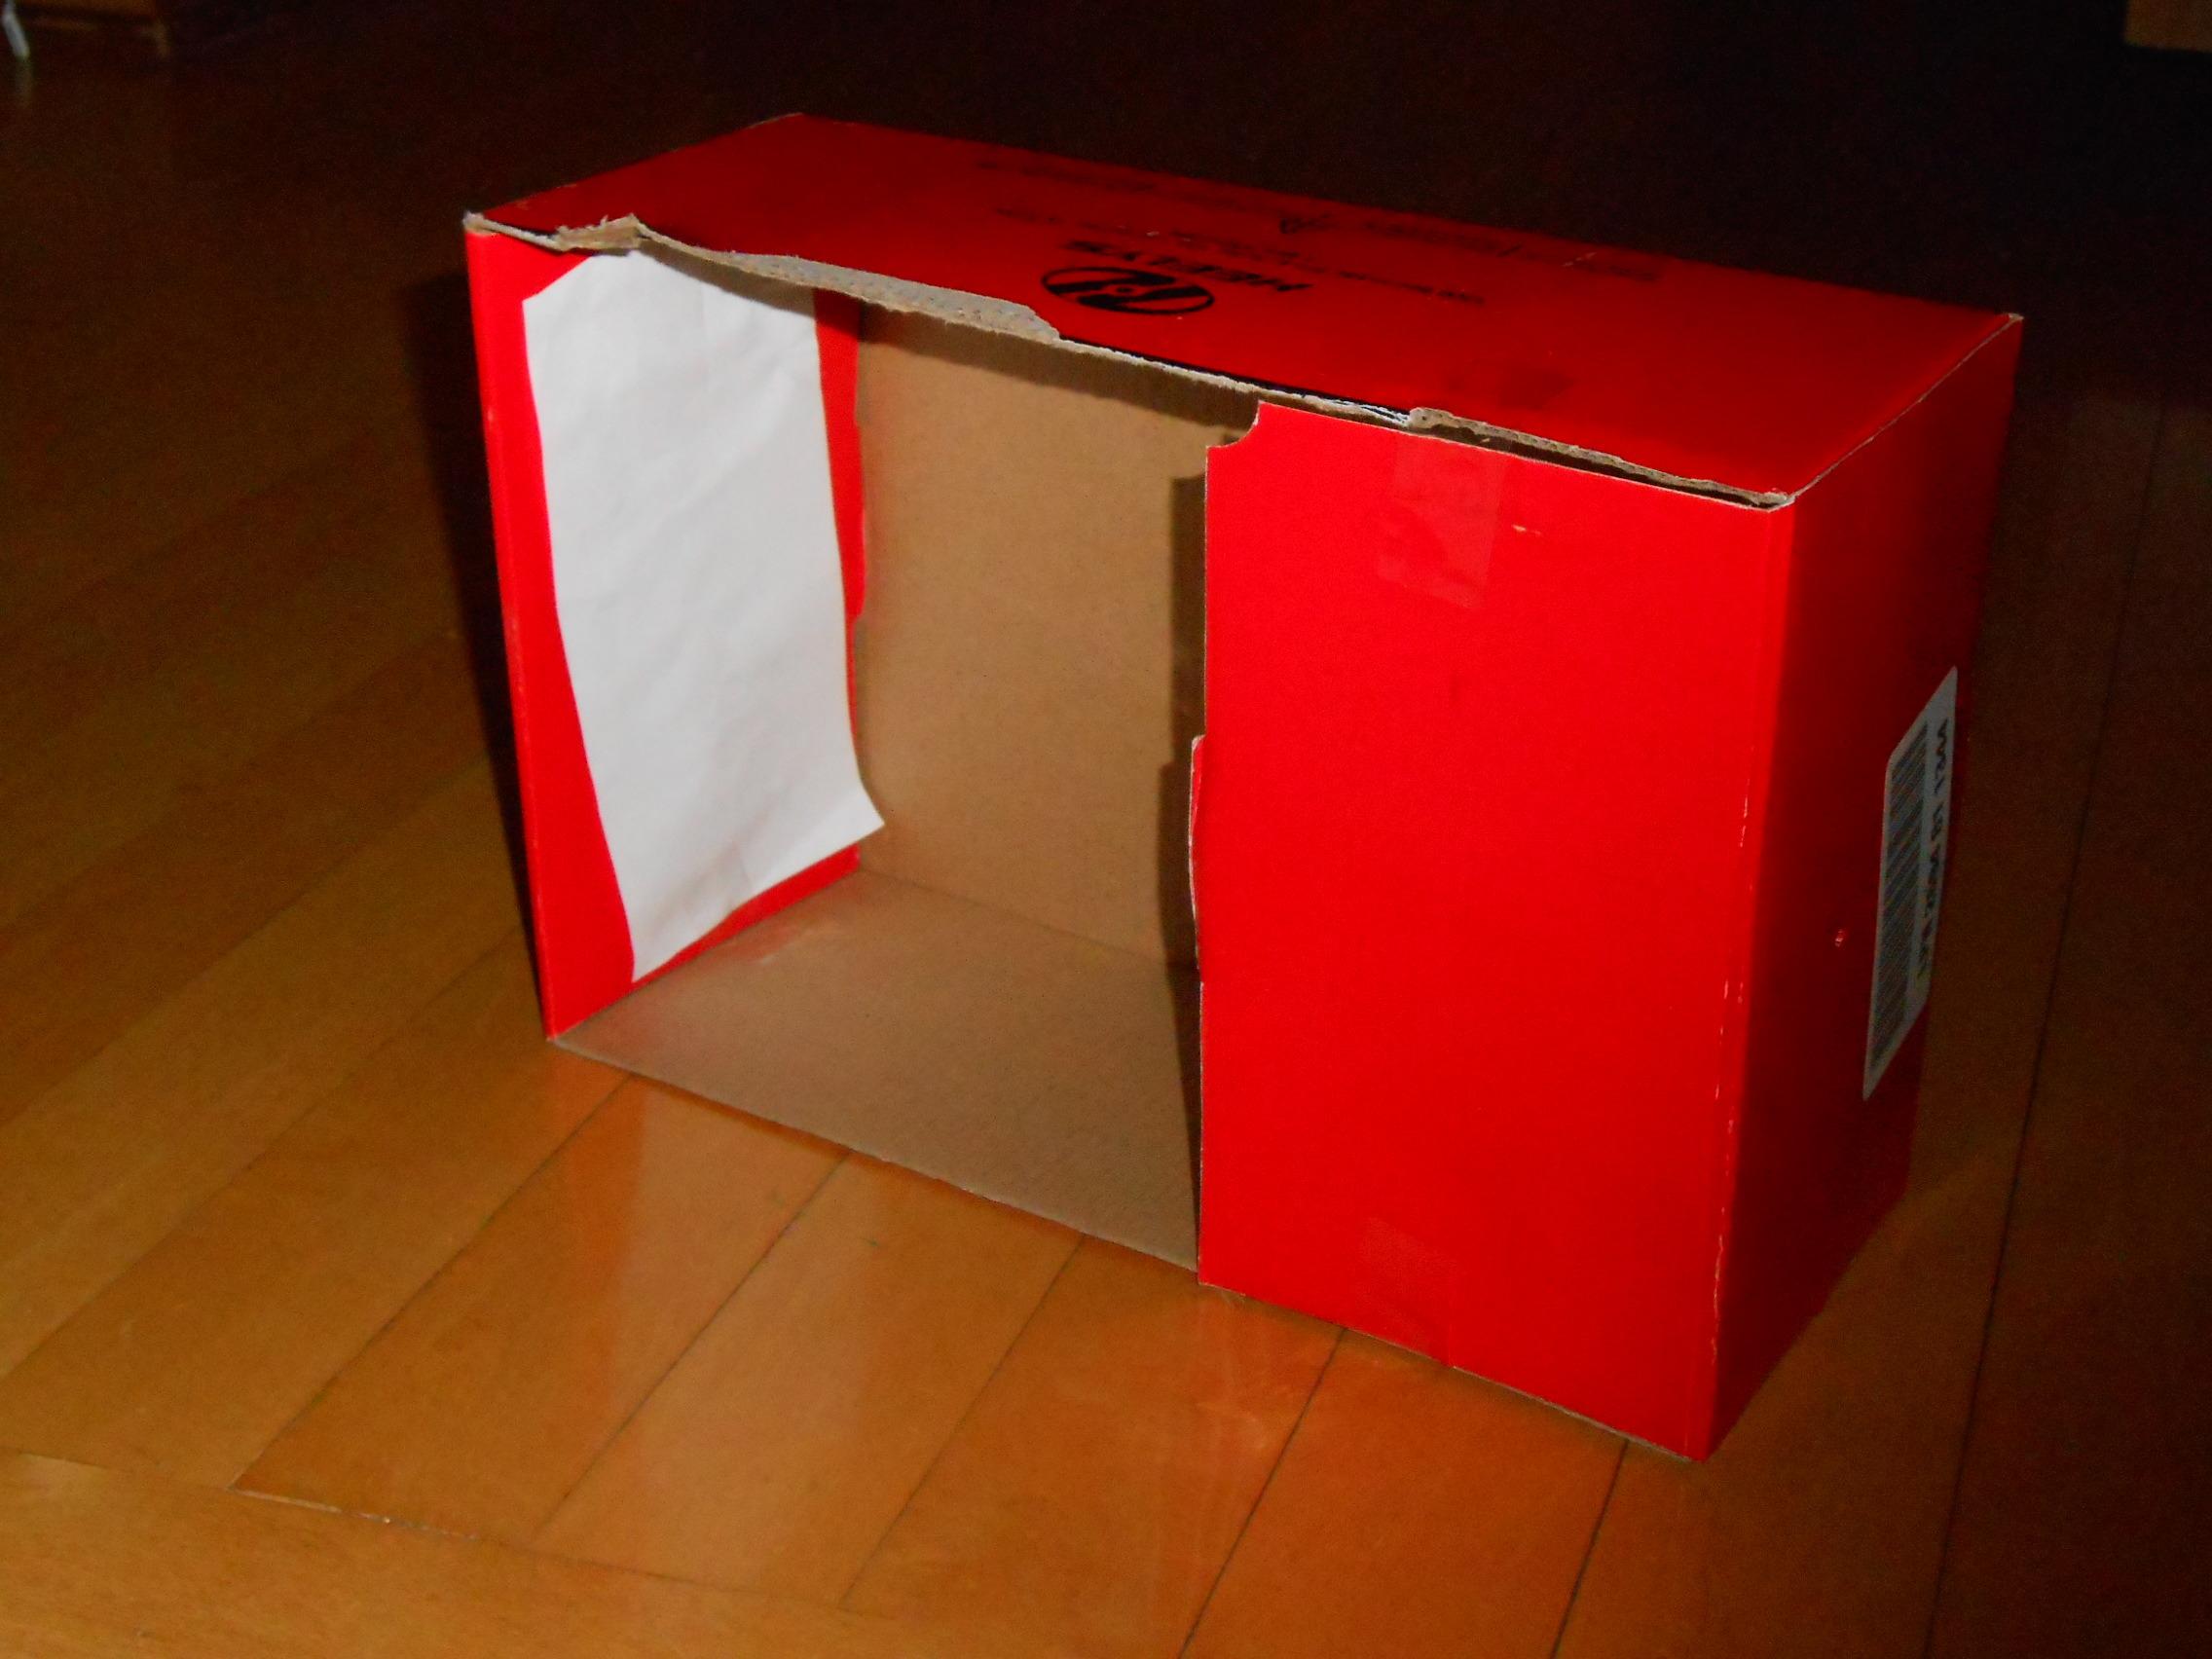 Solar Eclipse Projection Box Diy